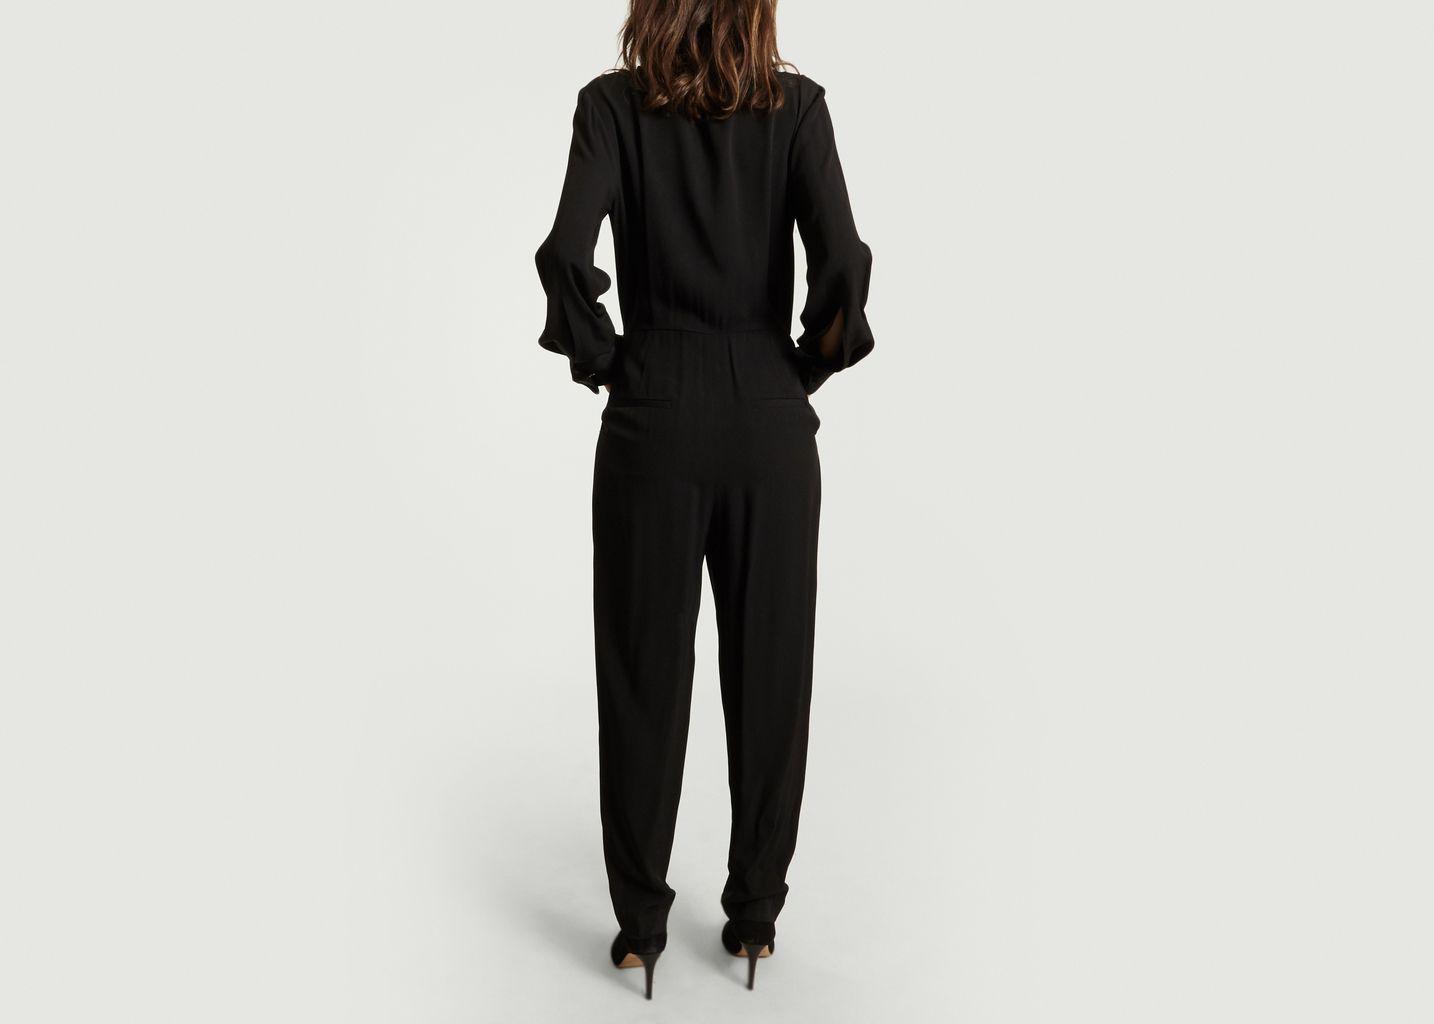 Combinaison Tailleur - Tara Jarmon